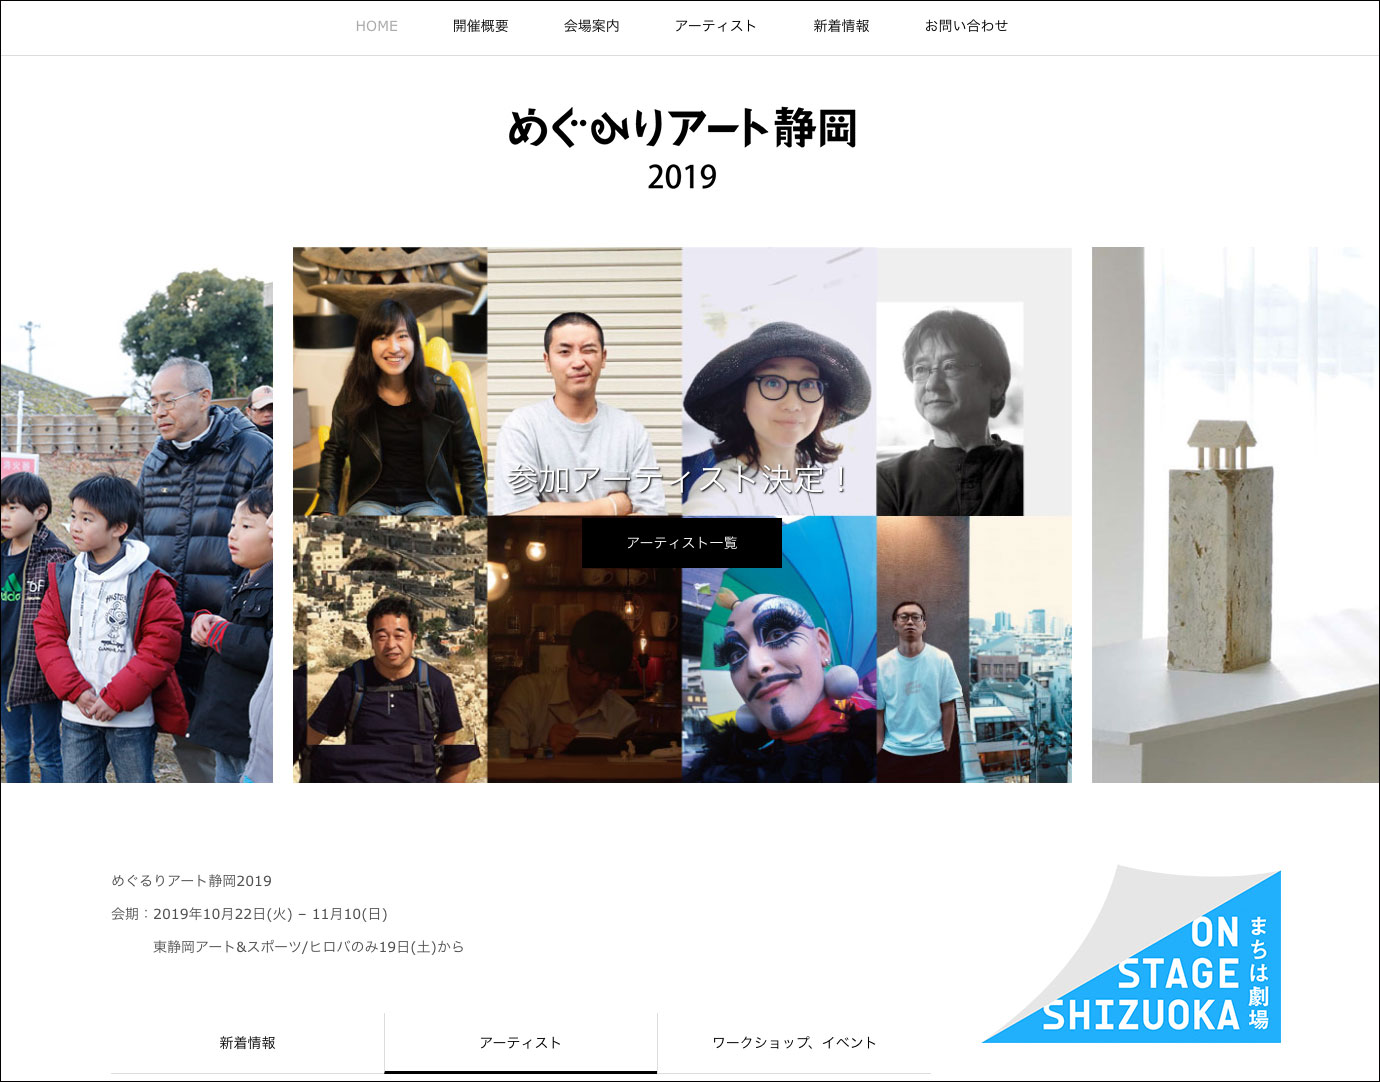 めぐるりアート静岡2019